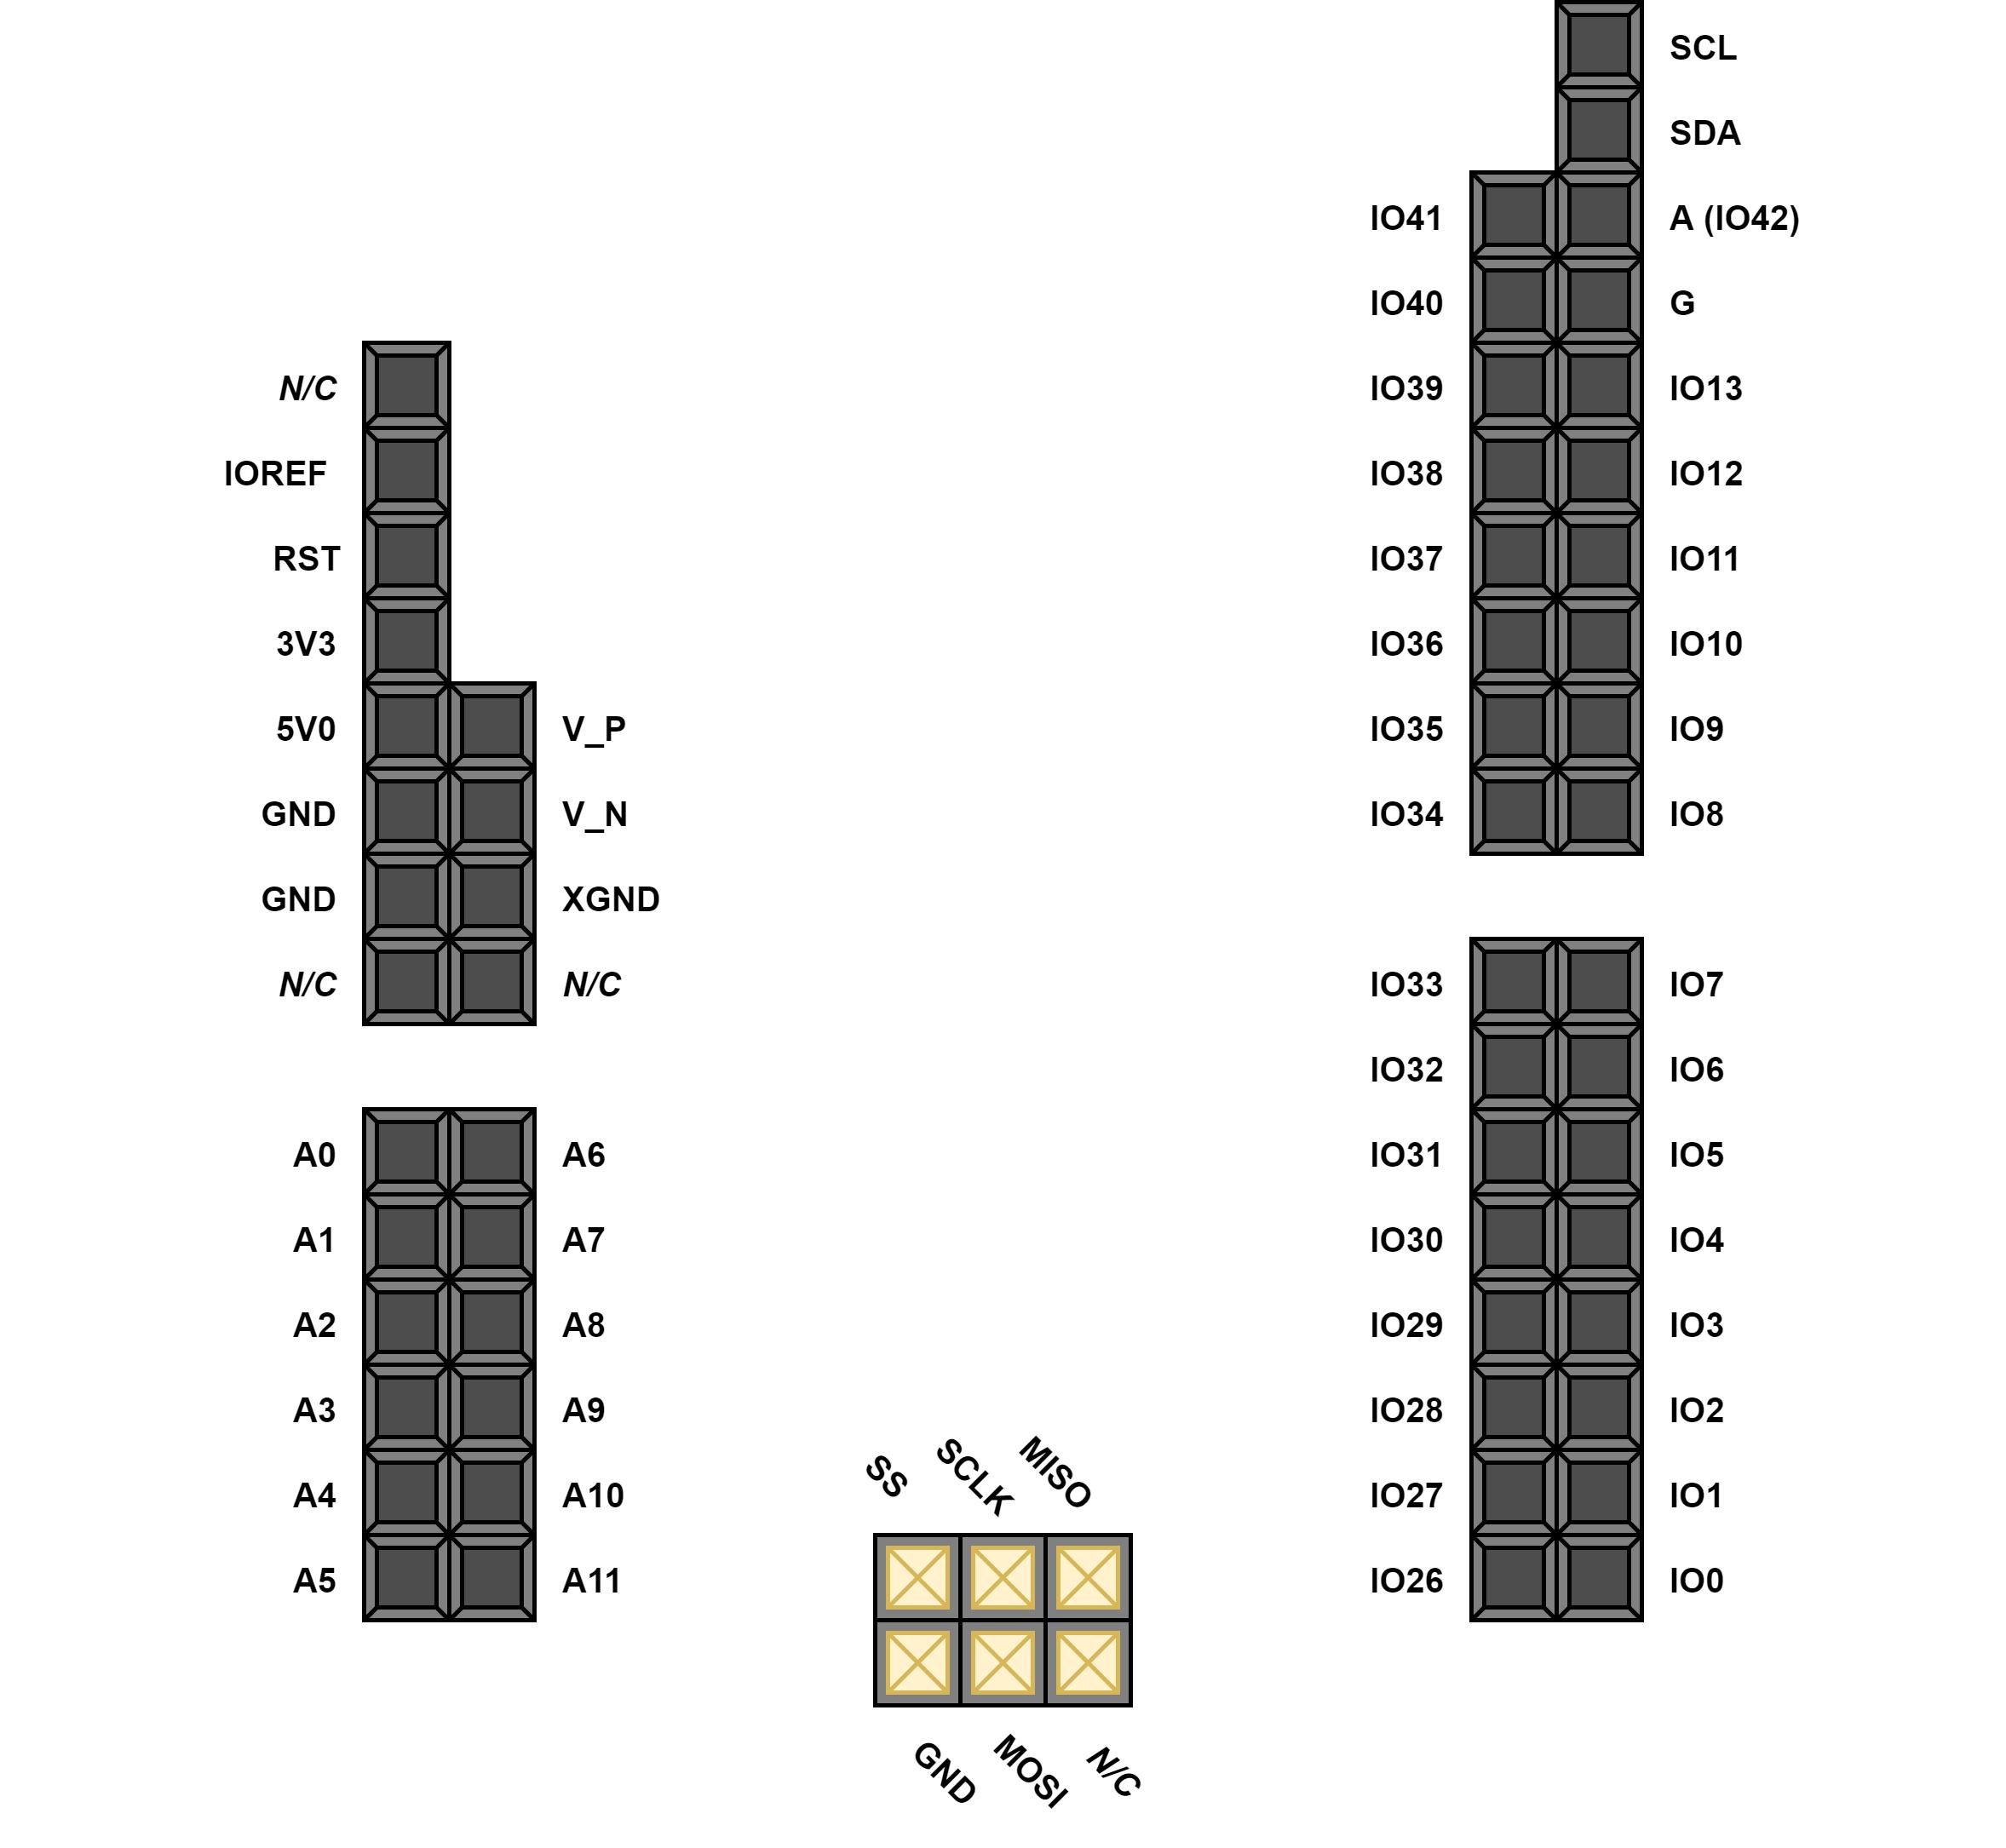 Figure 13.1. Shield connector pin diagram